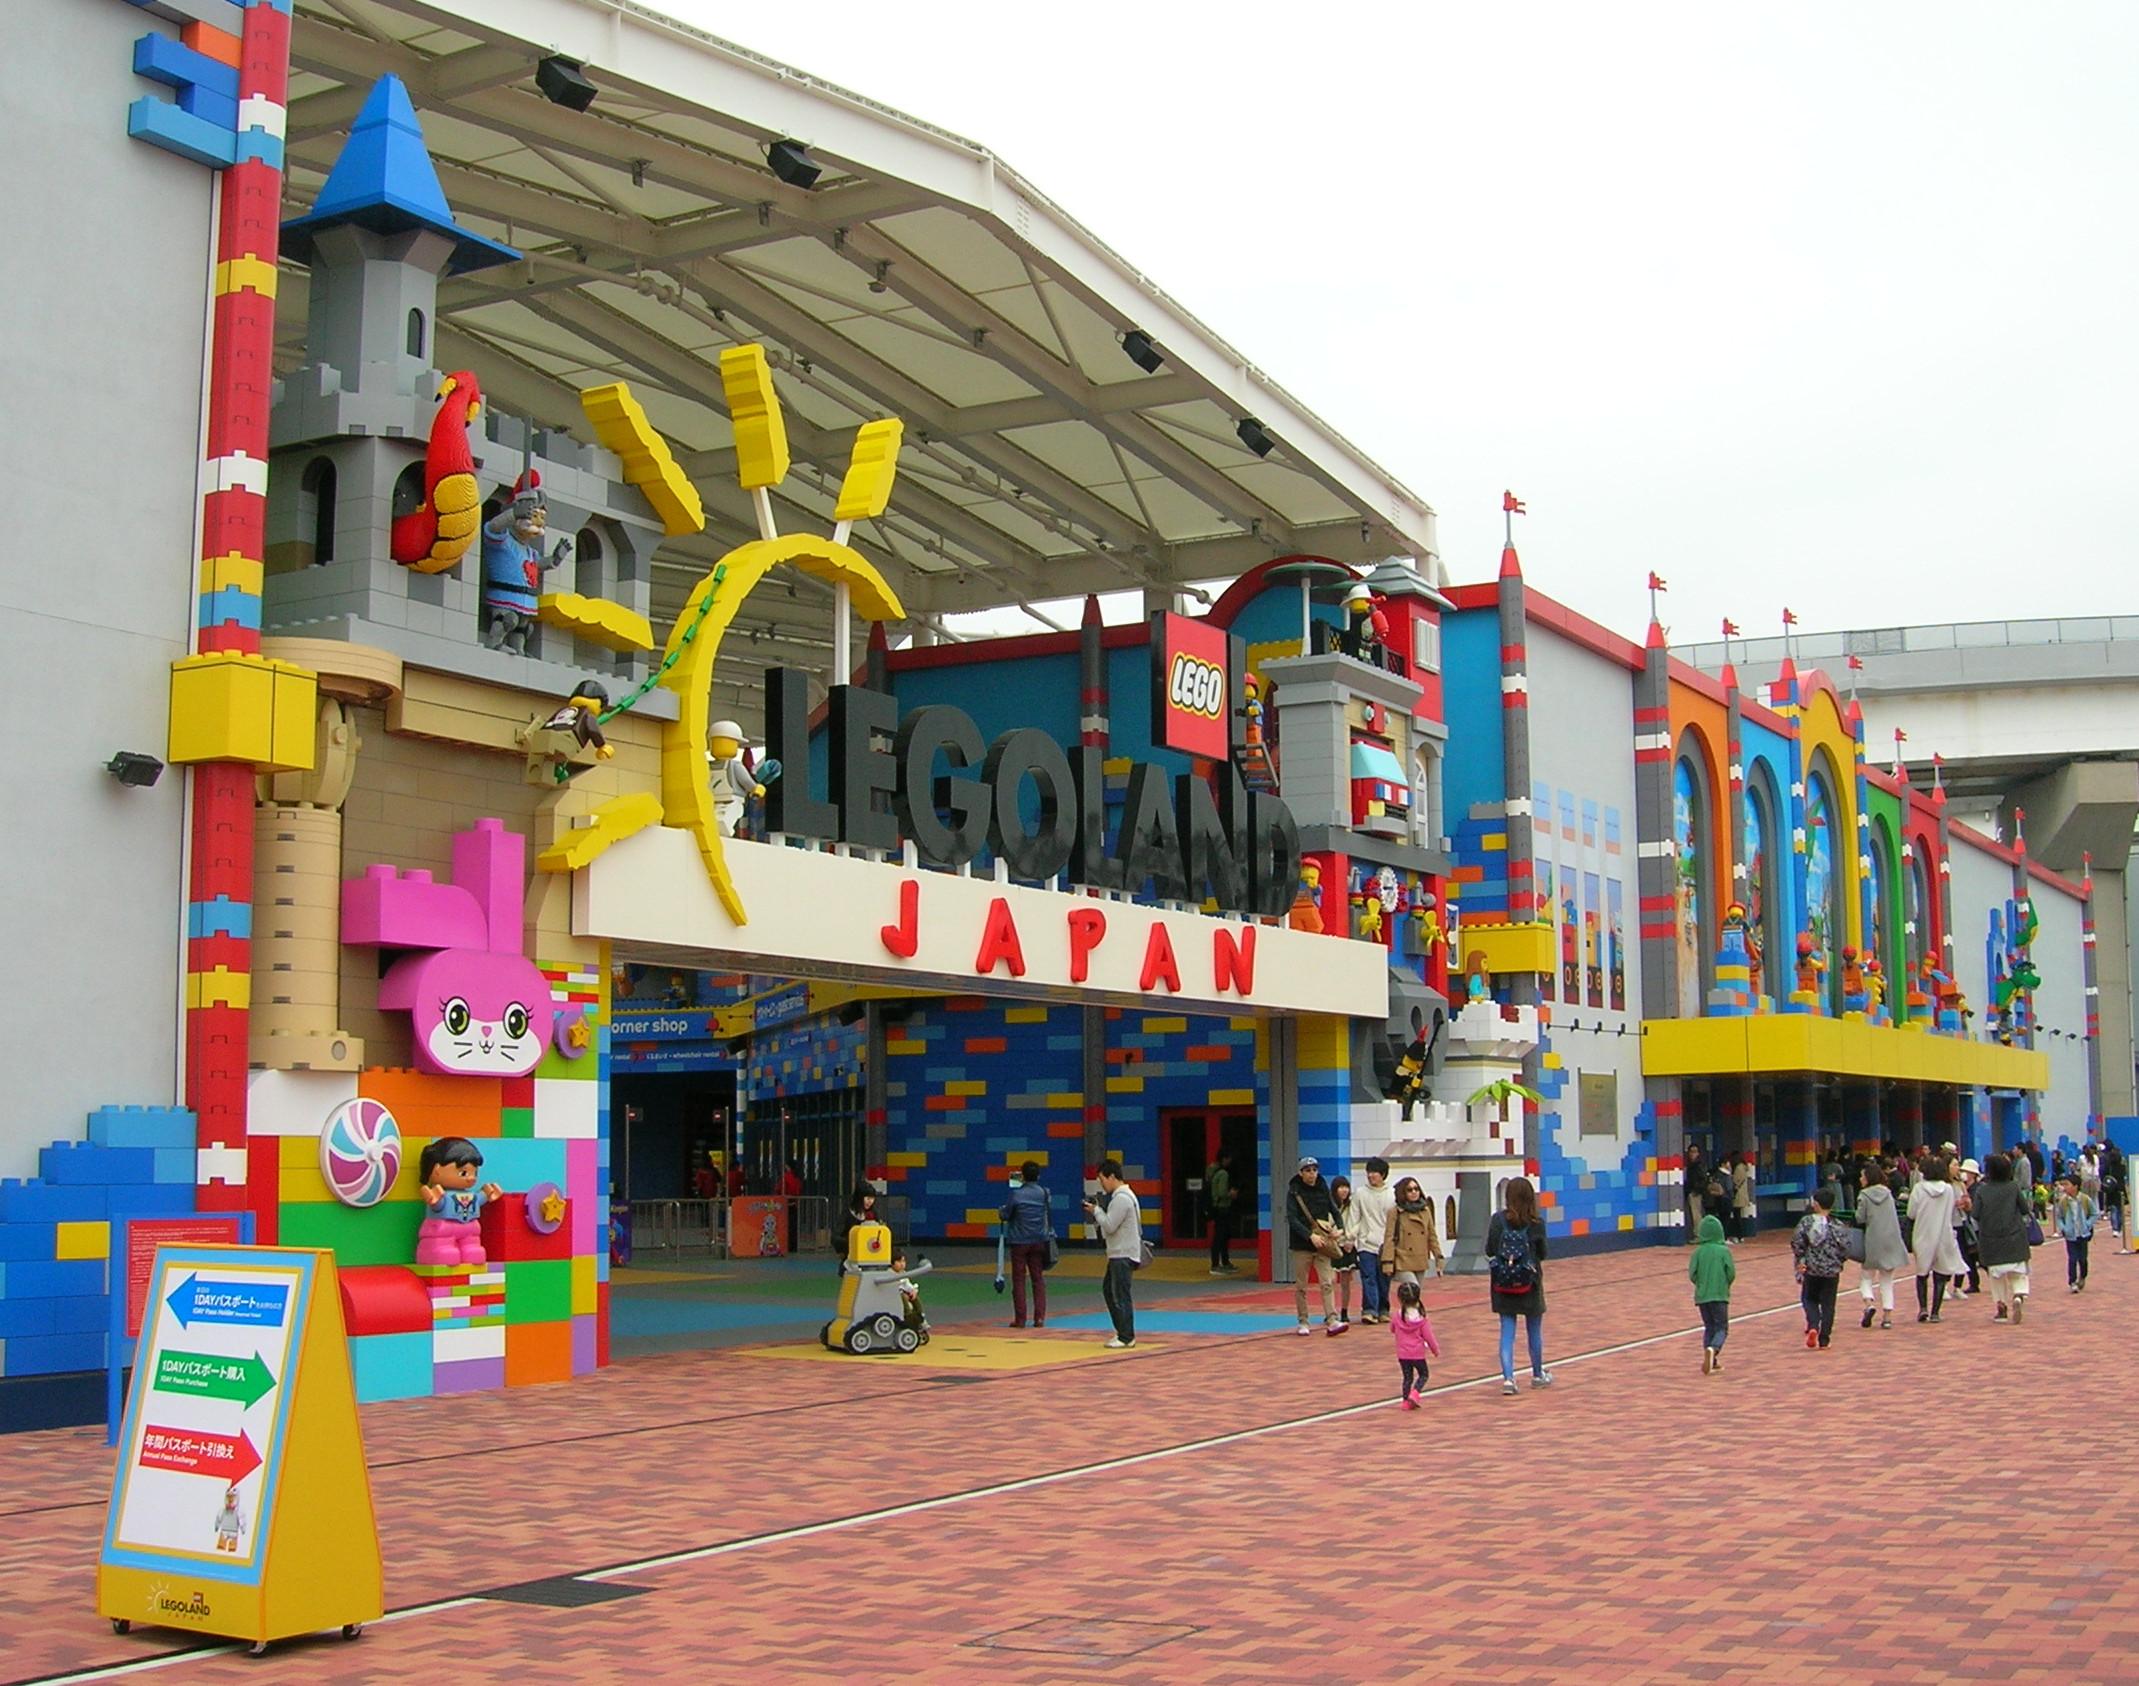 Legoland Japan-Entrance gate-20170410.jpg